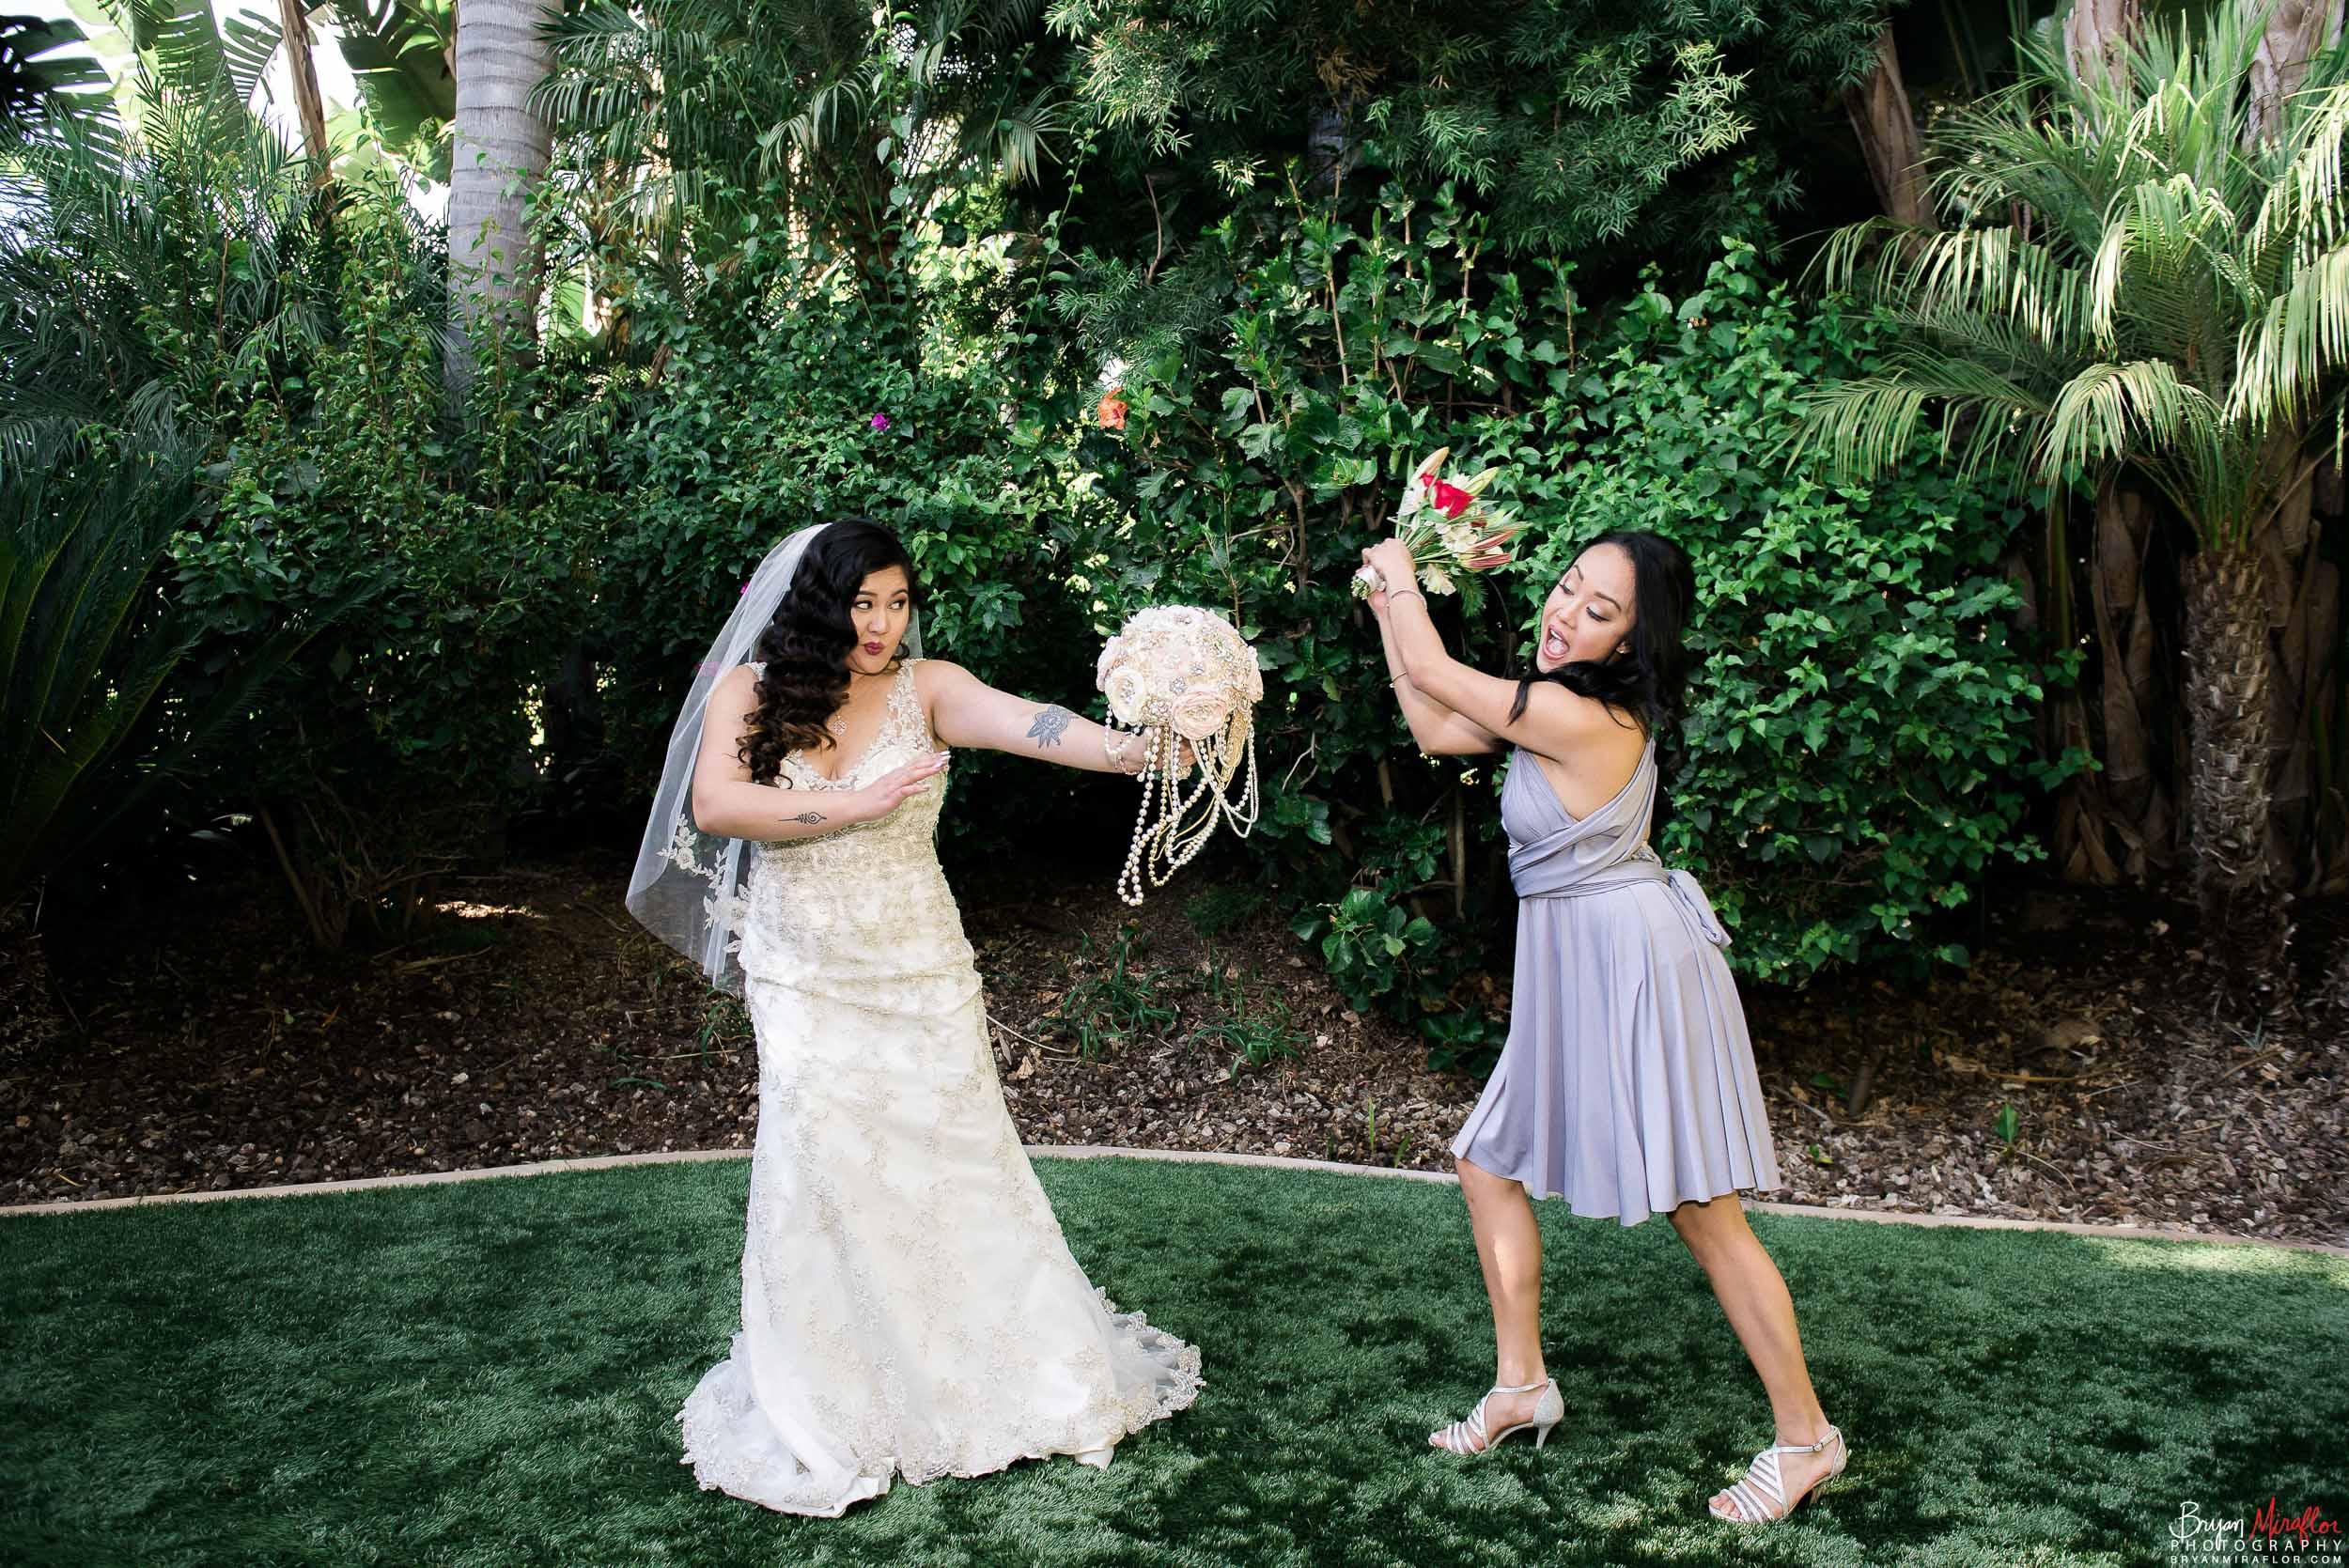 Bryan-Miraflor-Photography-Hannah-Jonathan-Married-Grand-Traditions-Estate-Gardens-Fallbrook-20171222-123.jpg